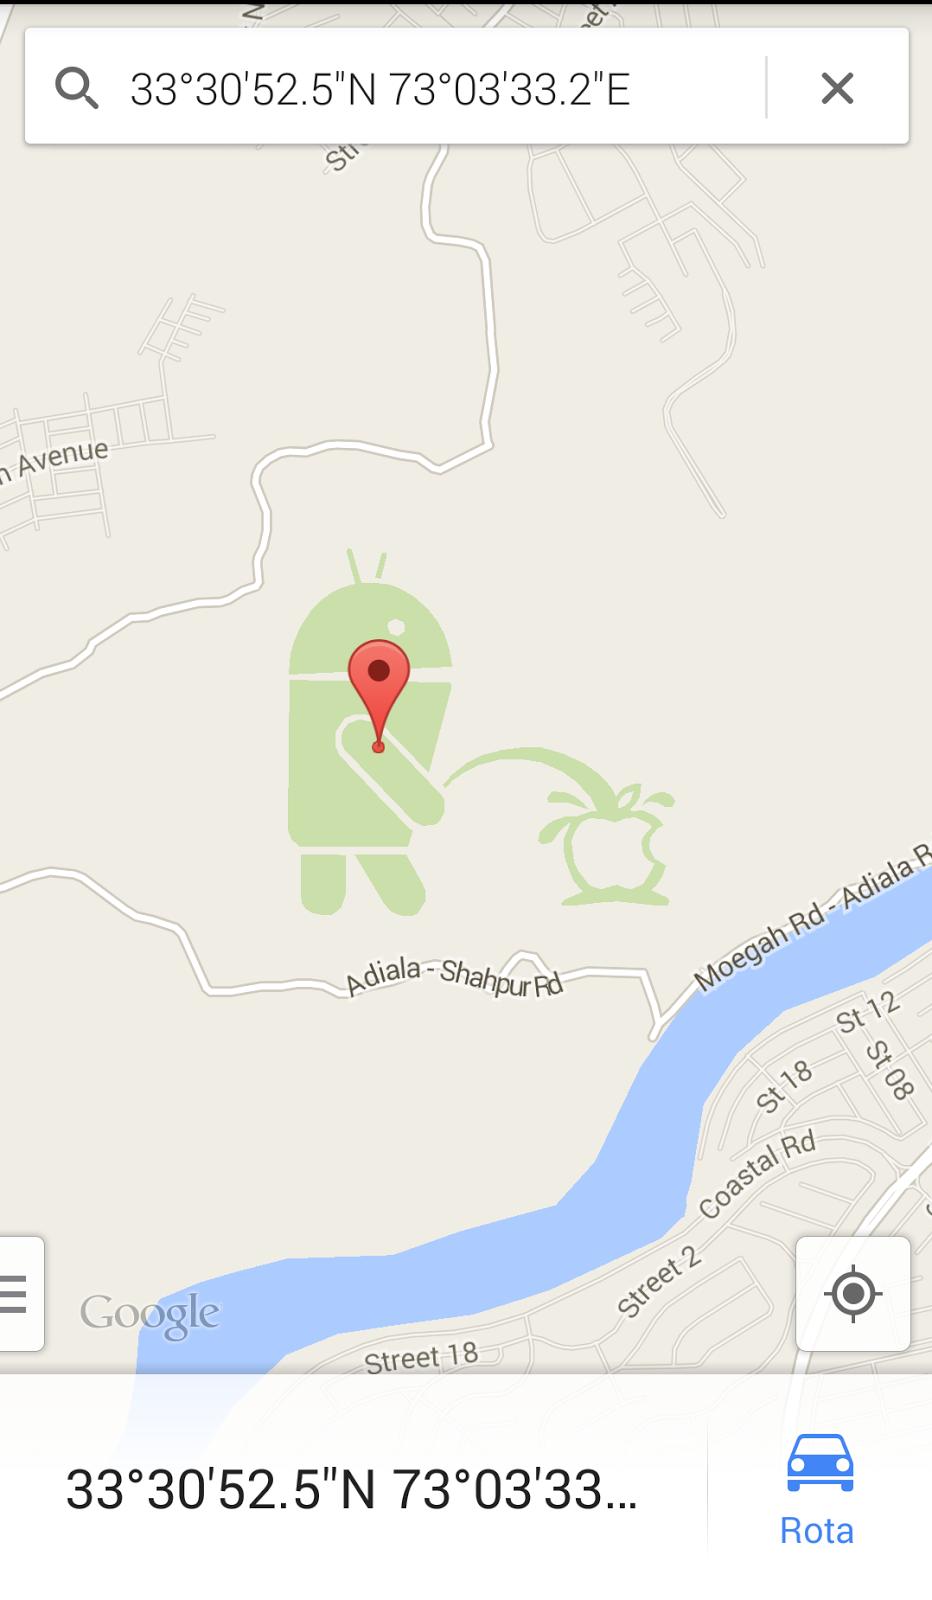 Google Maps Android Apple Logosuna Ne Yaptı?